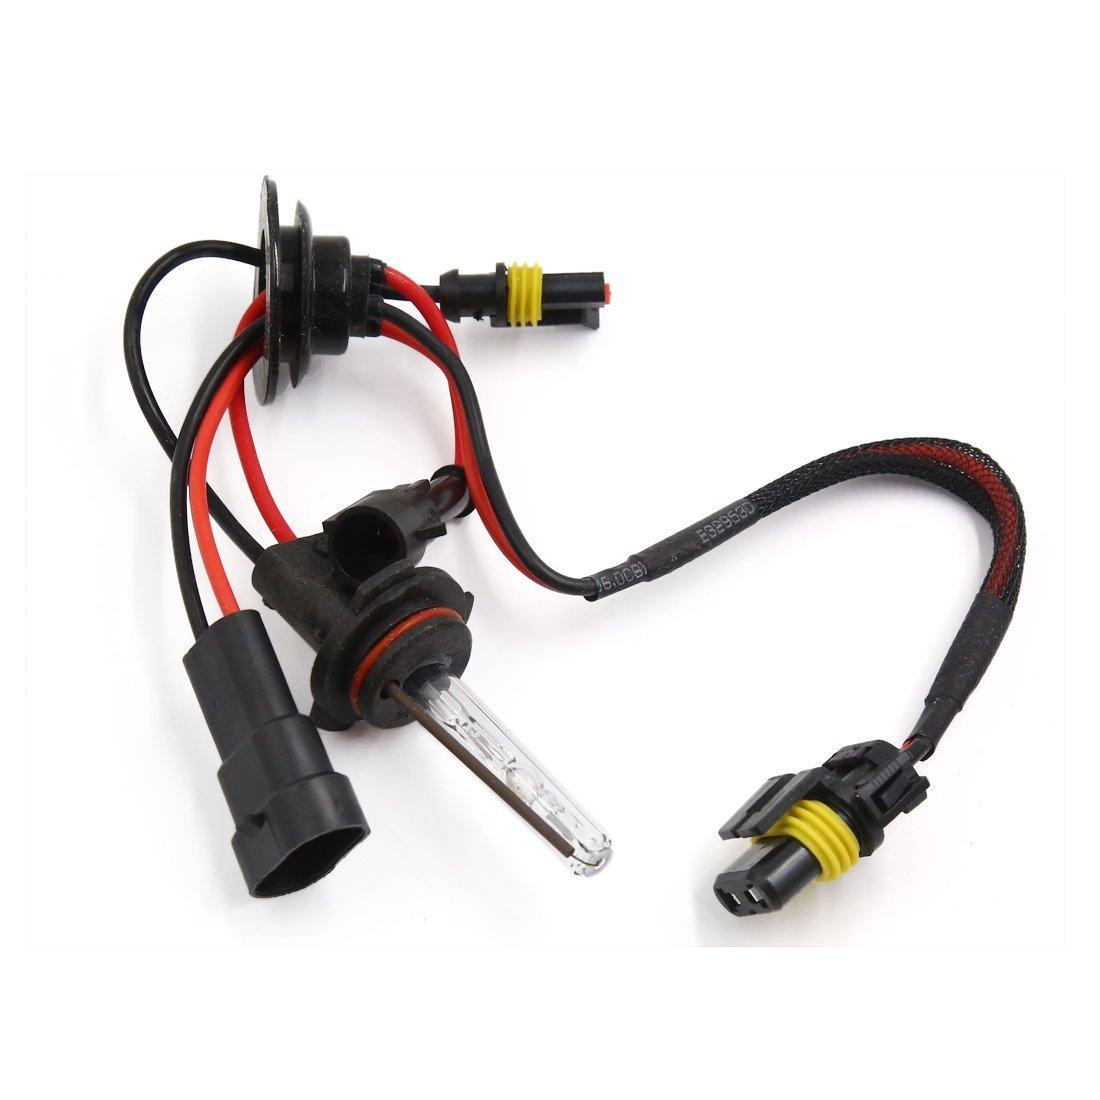 DealMux 9006 4300K ??Branco HID Xenon Bulb Conversion Kit Head Lamp Luz para carro